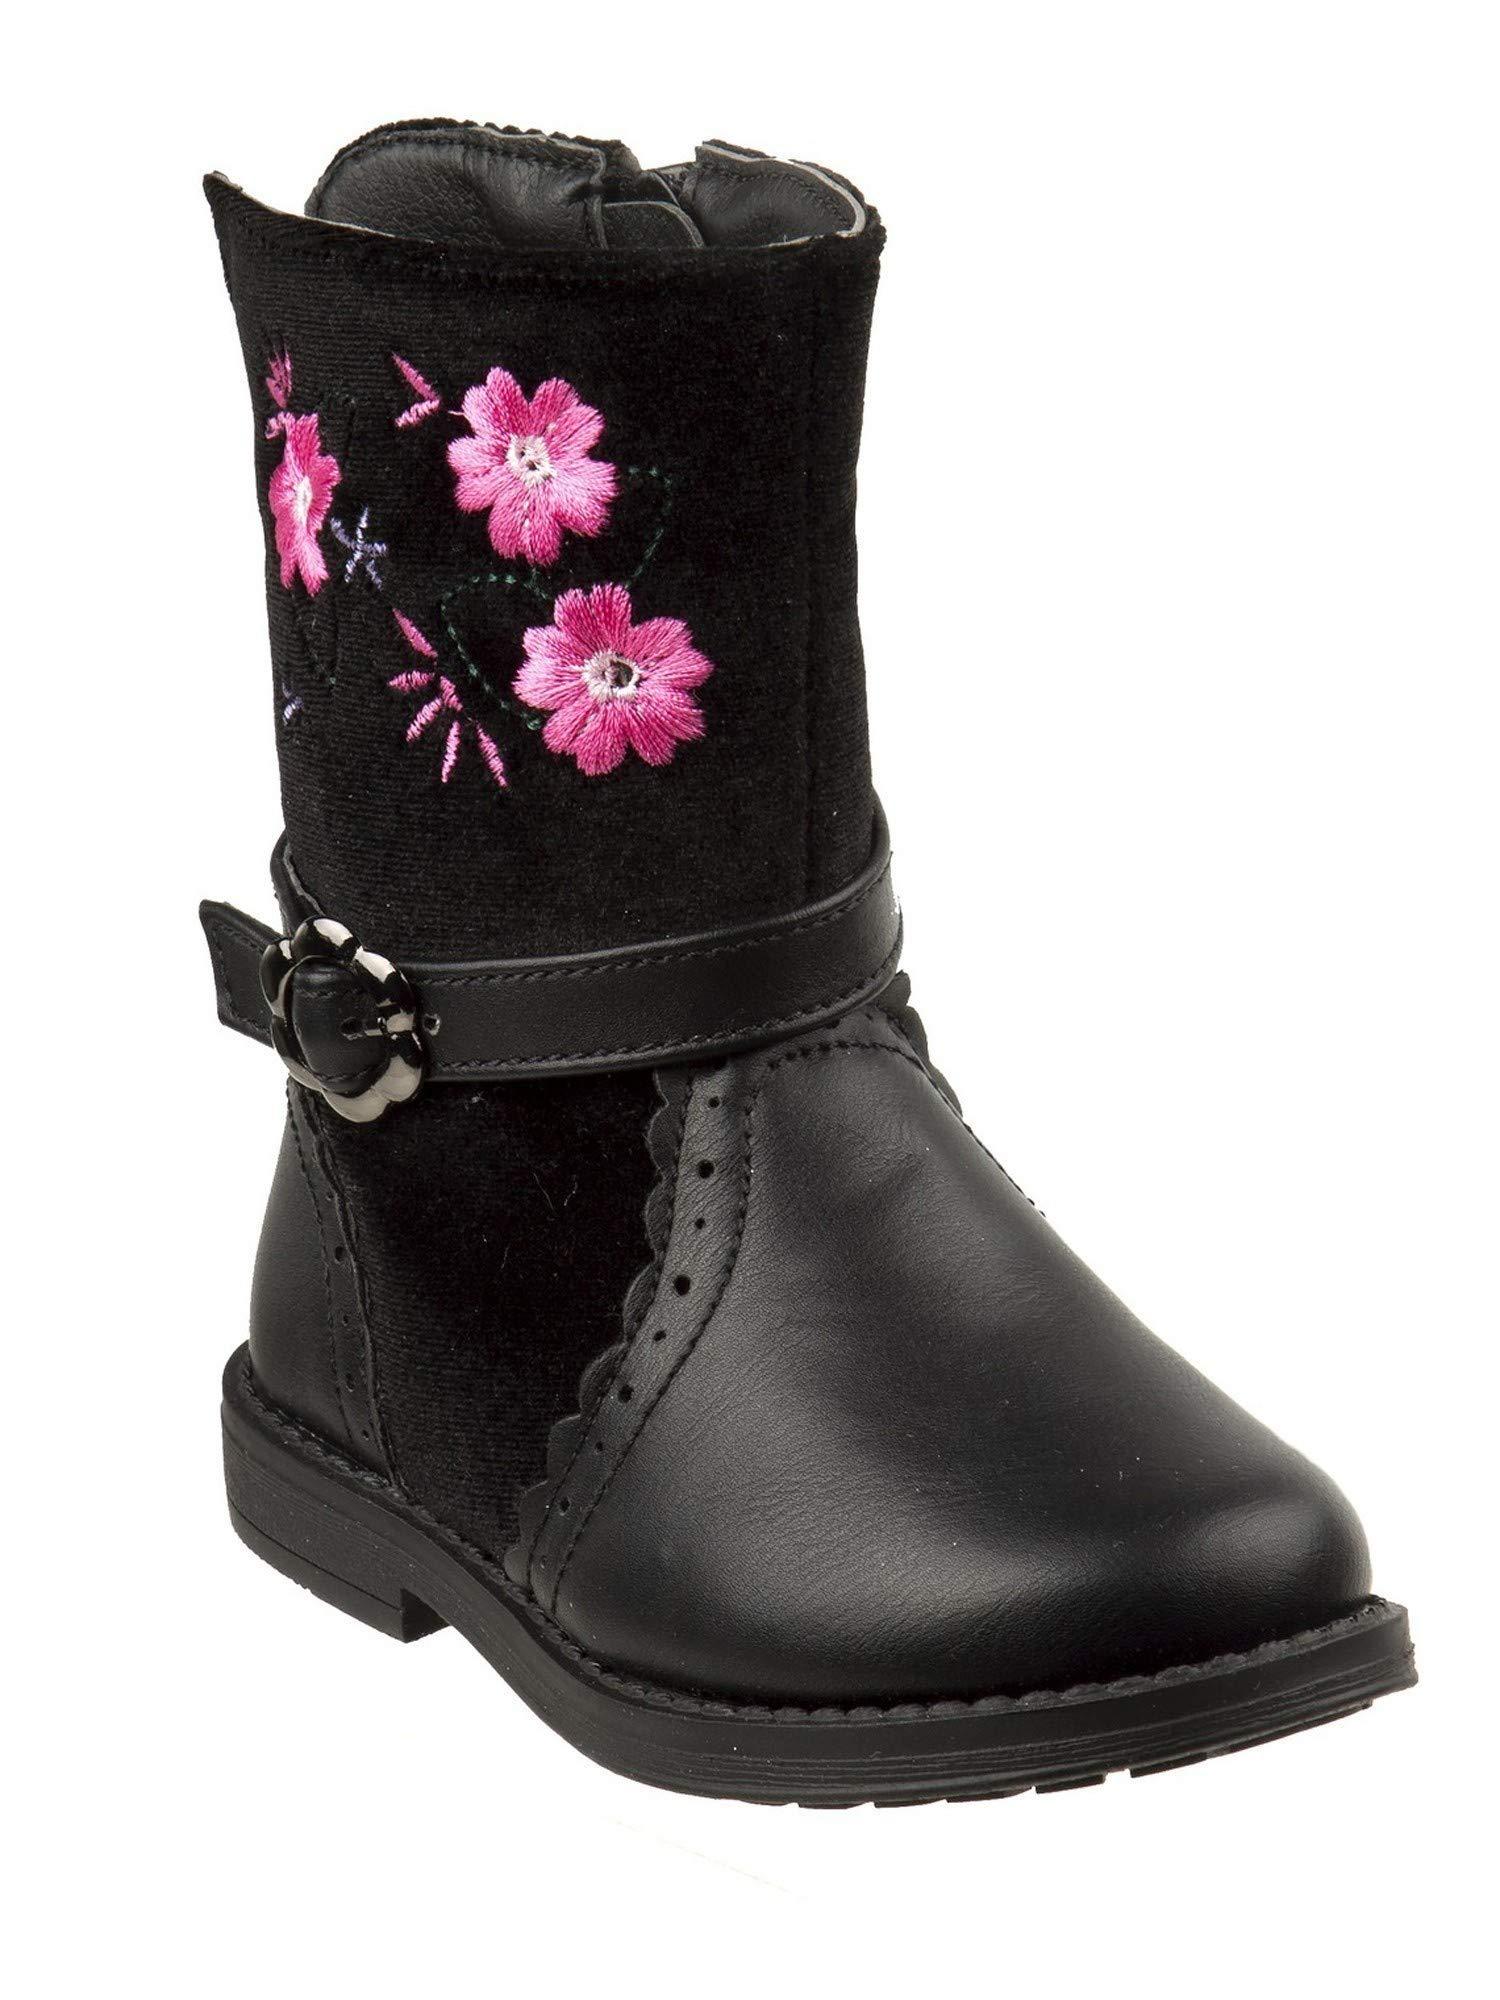 Laura Ashley Little Girls Black Pink Floral Buckle Strap Boots 8 Toddler